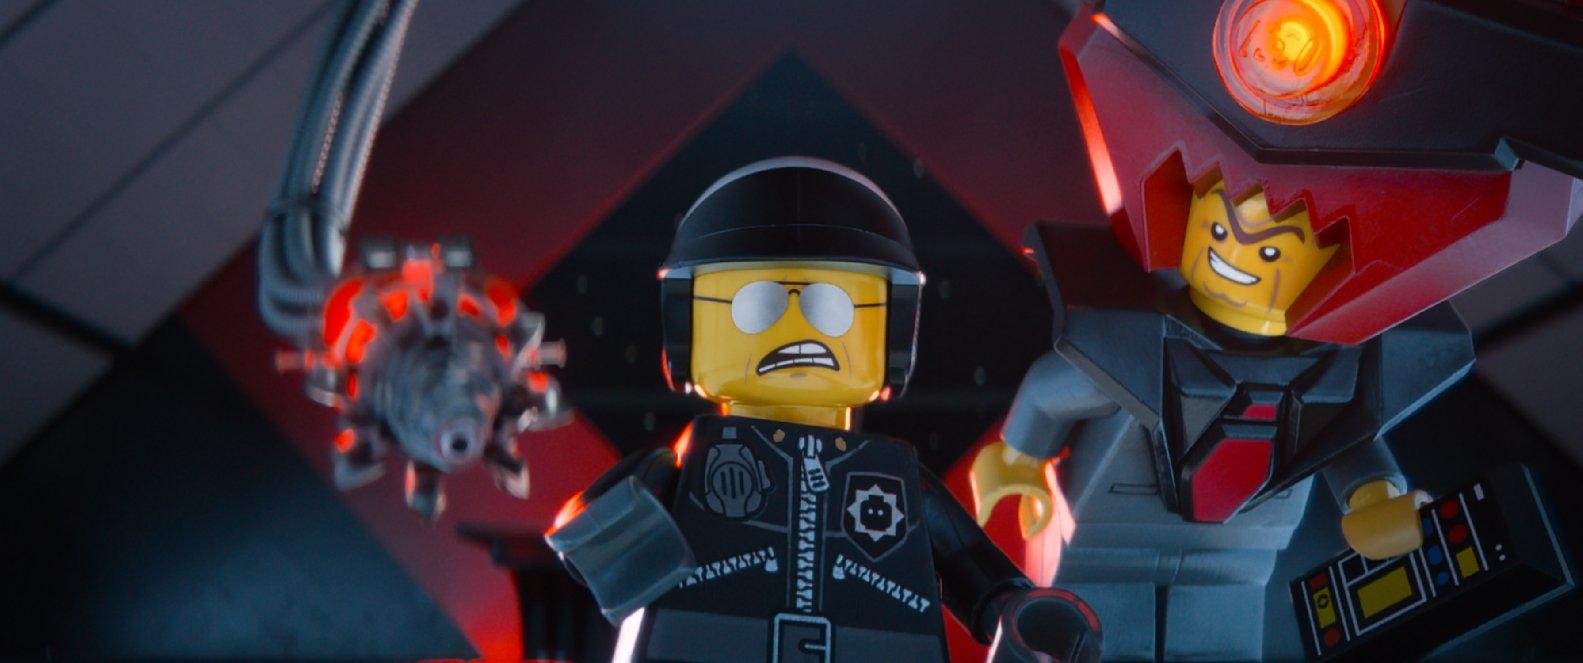 LEGO_jelenetfoto (33)